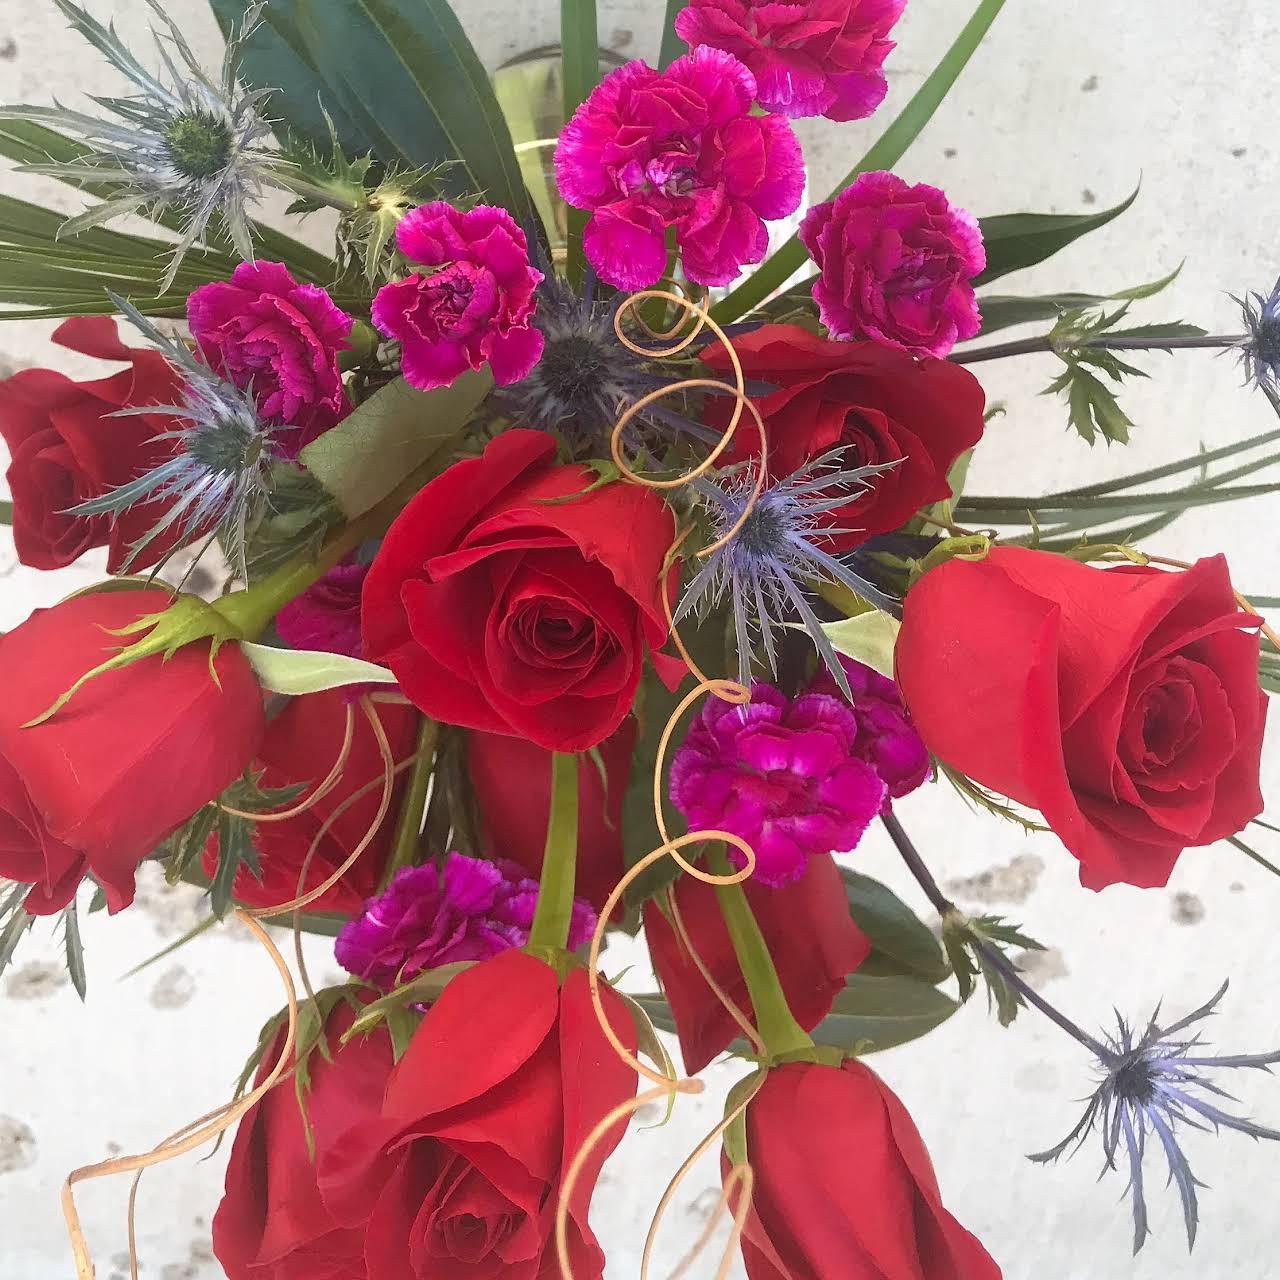 All The Pretty Flowers Florist In Santa Fe